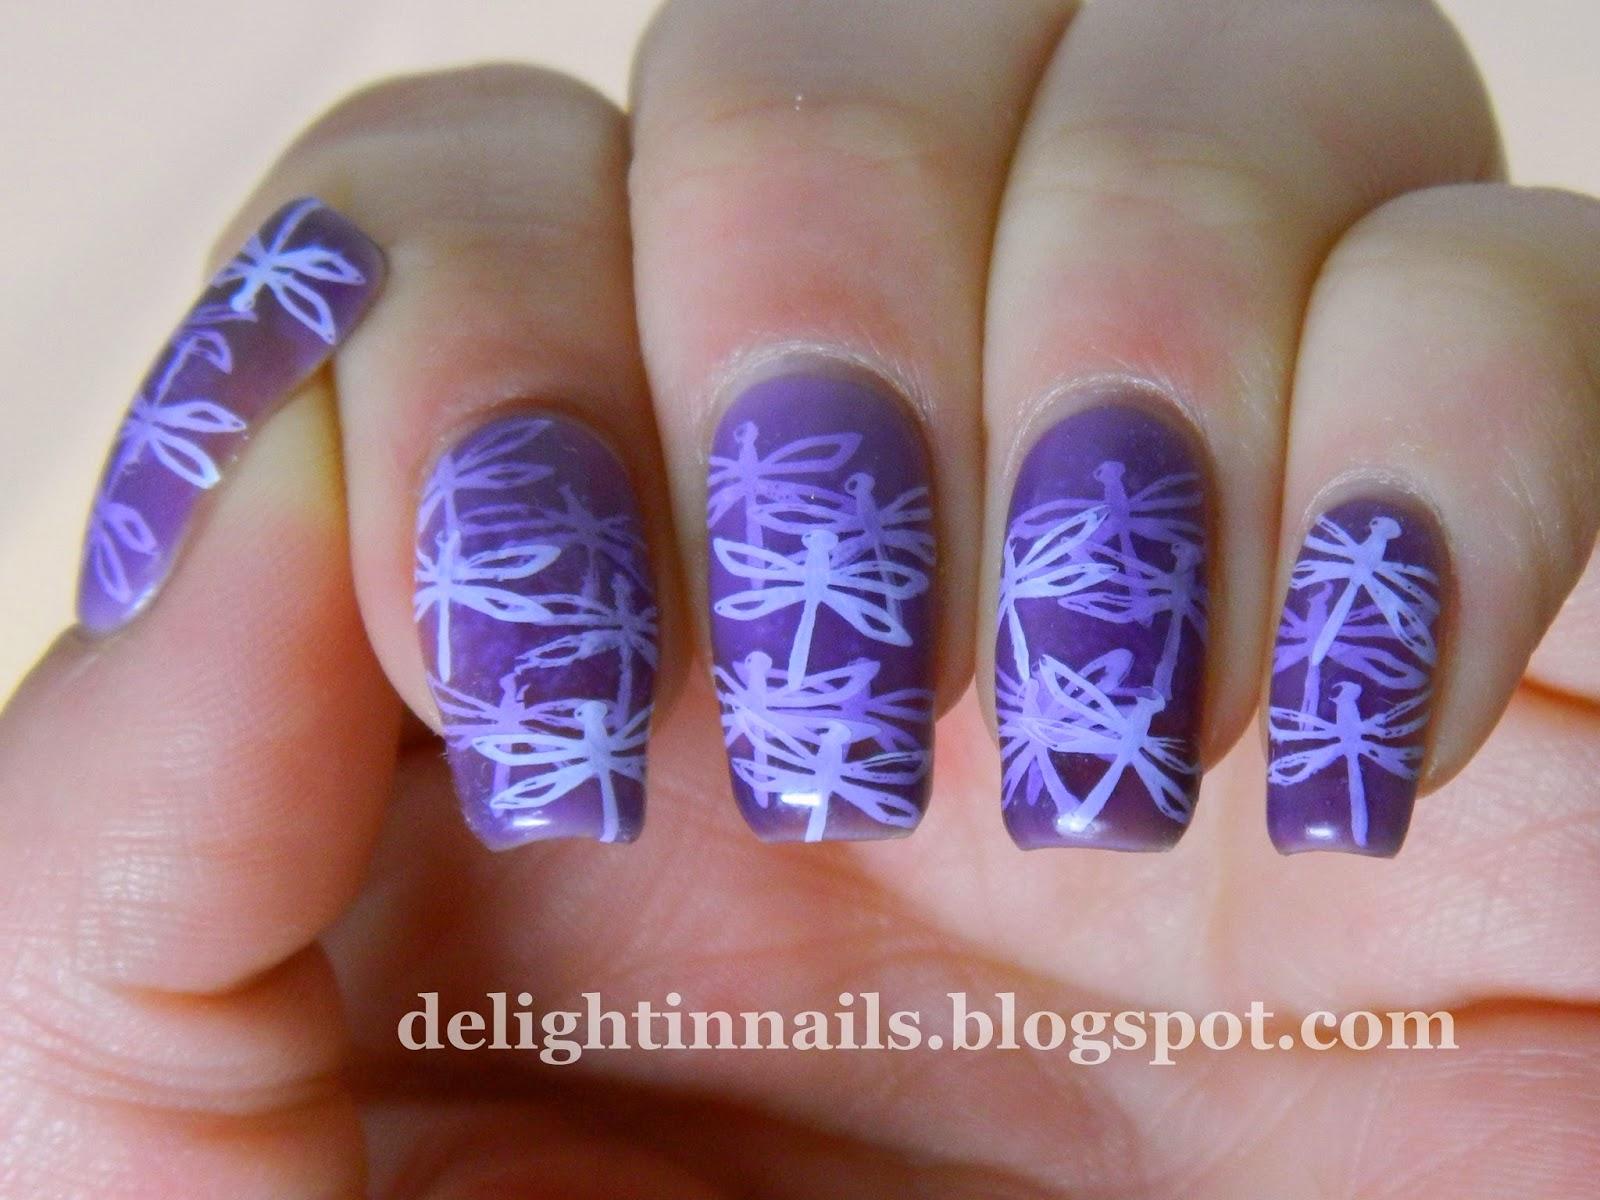 Julep Candy Pond Manicure